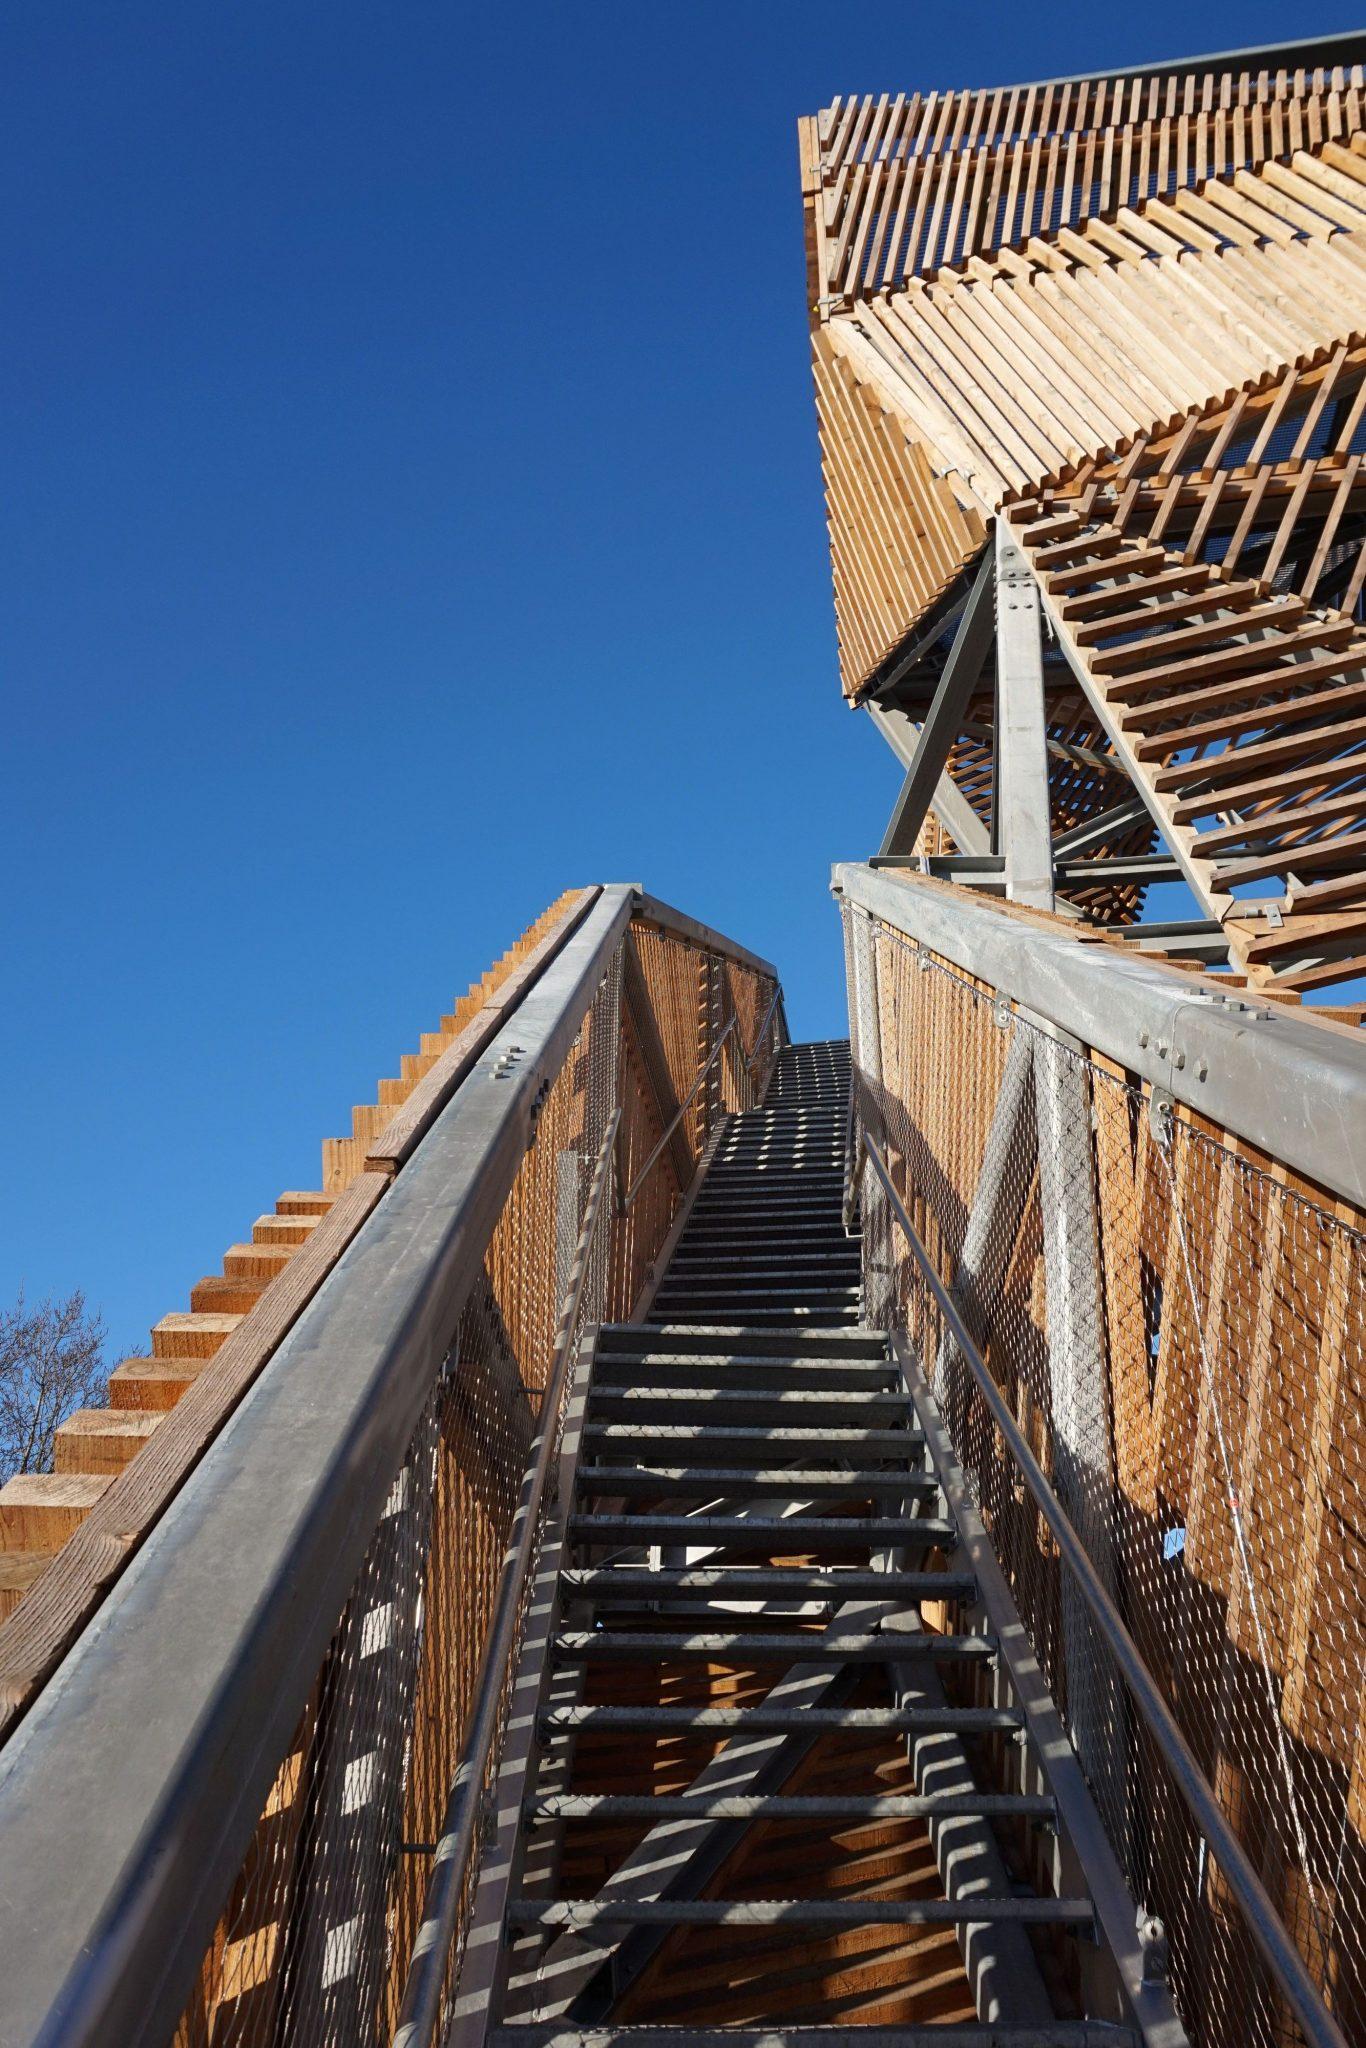 Ateliereen-uitkijktoren-onlanden-09